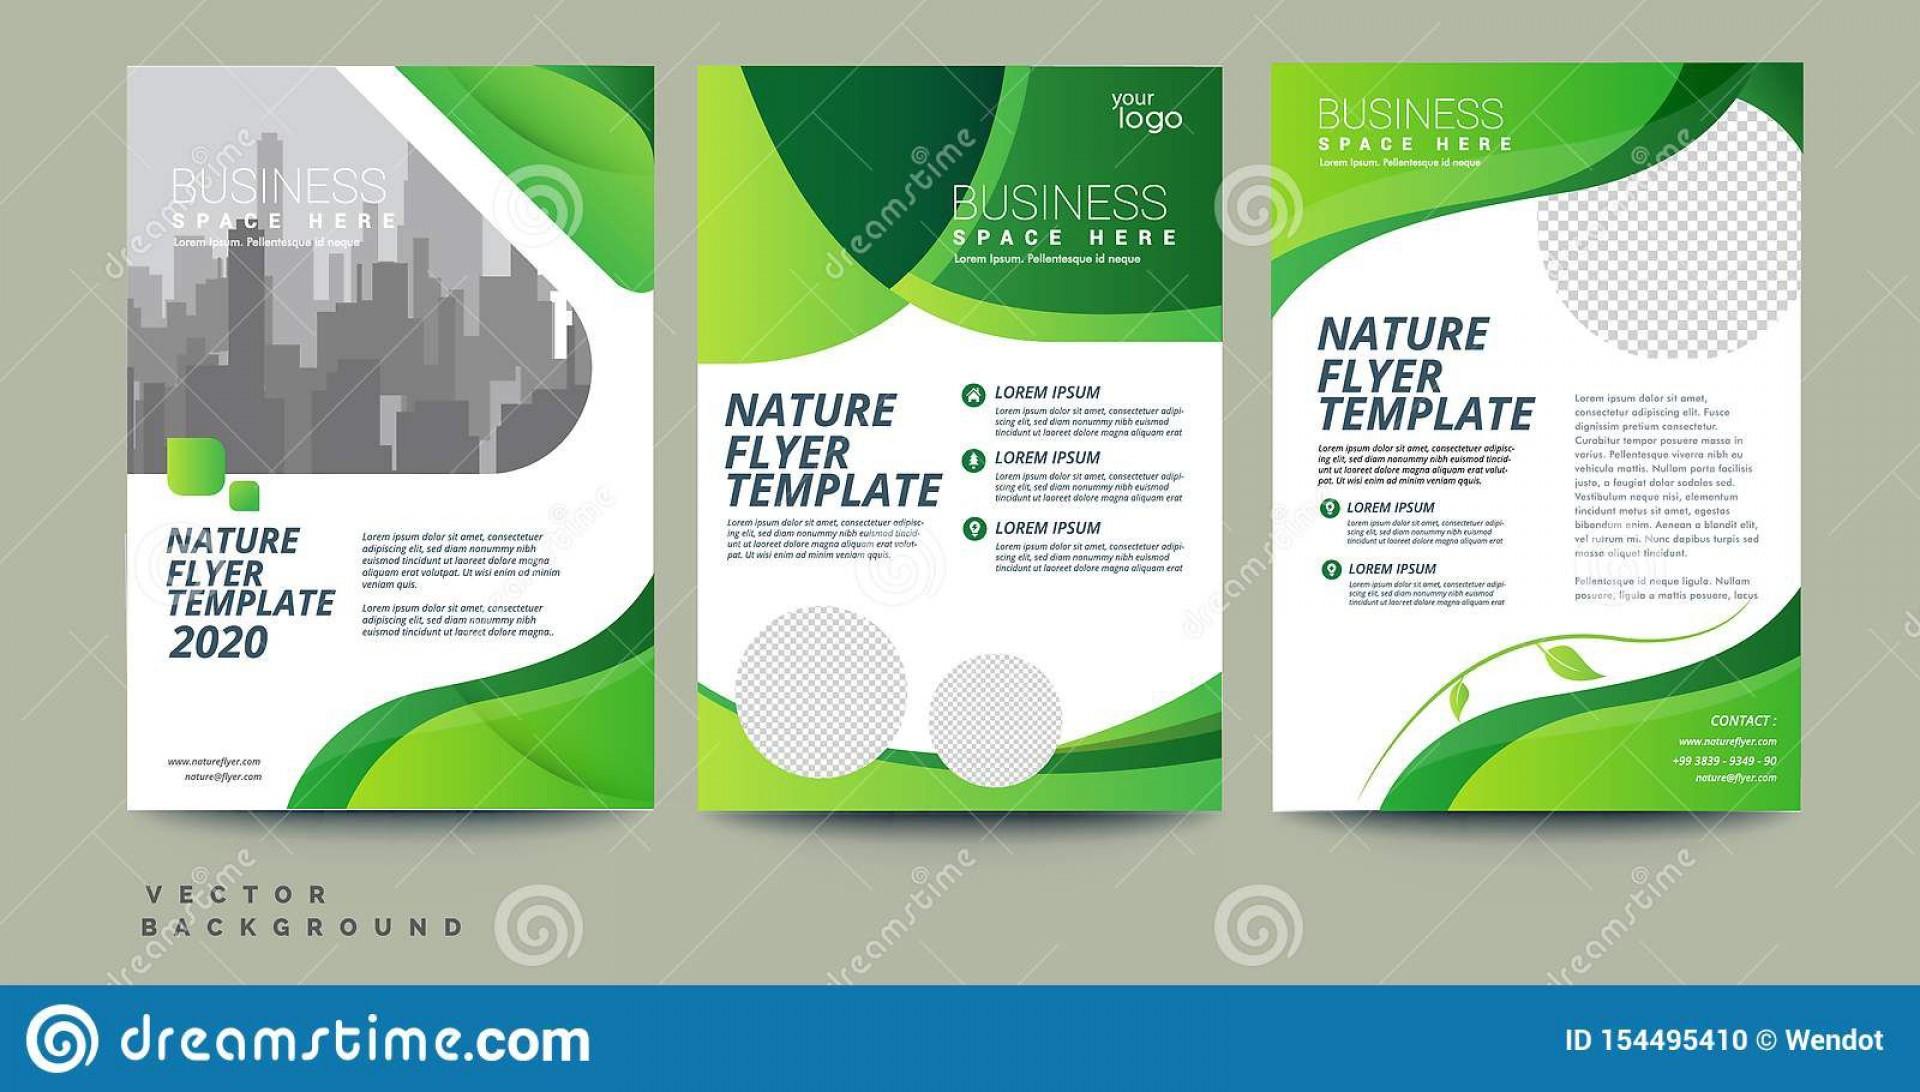 013 Singular Free Flyer Design Template High Resolution  Templates Online Download Psd1920